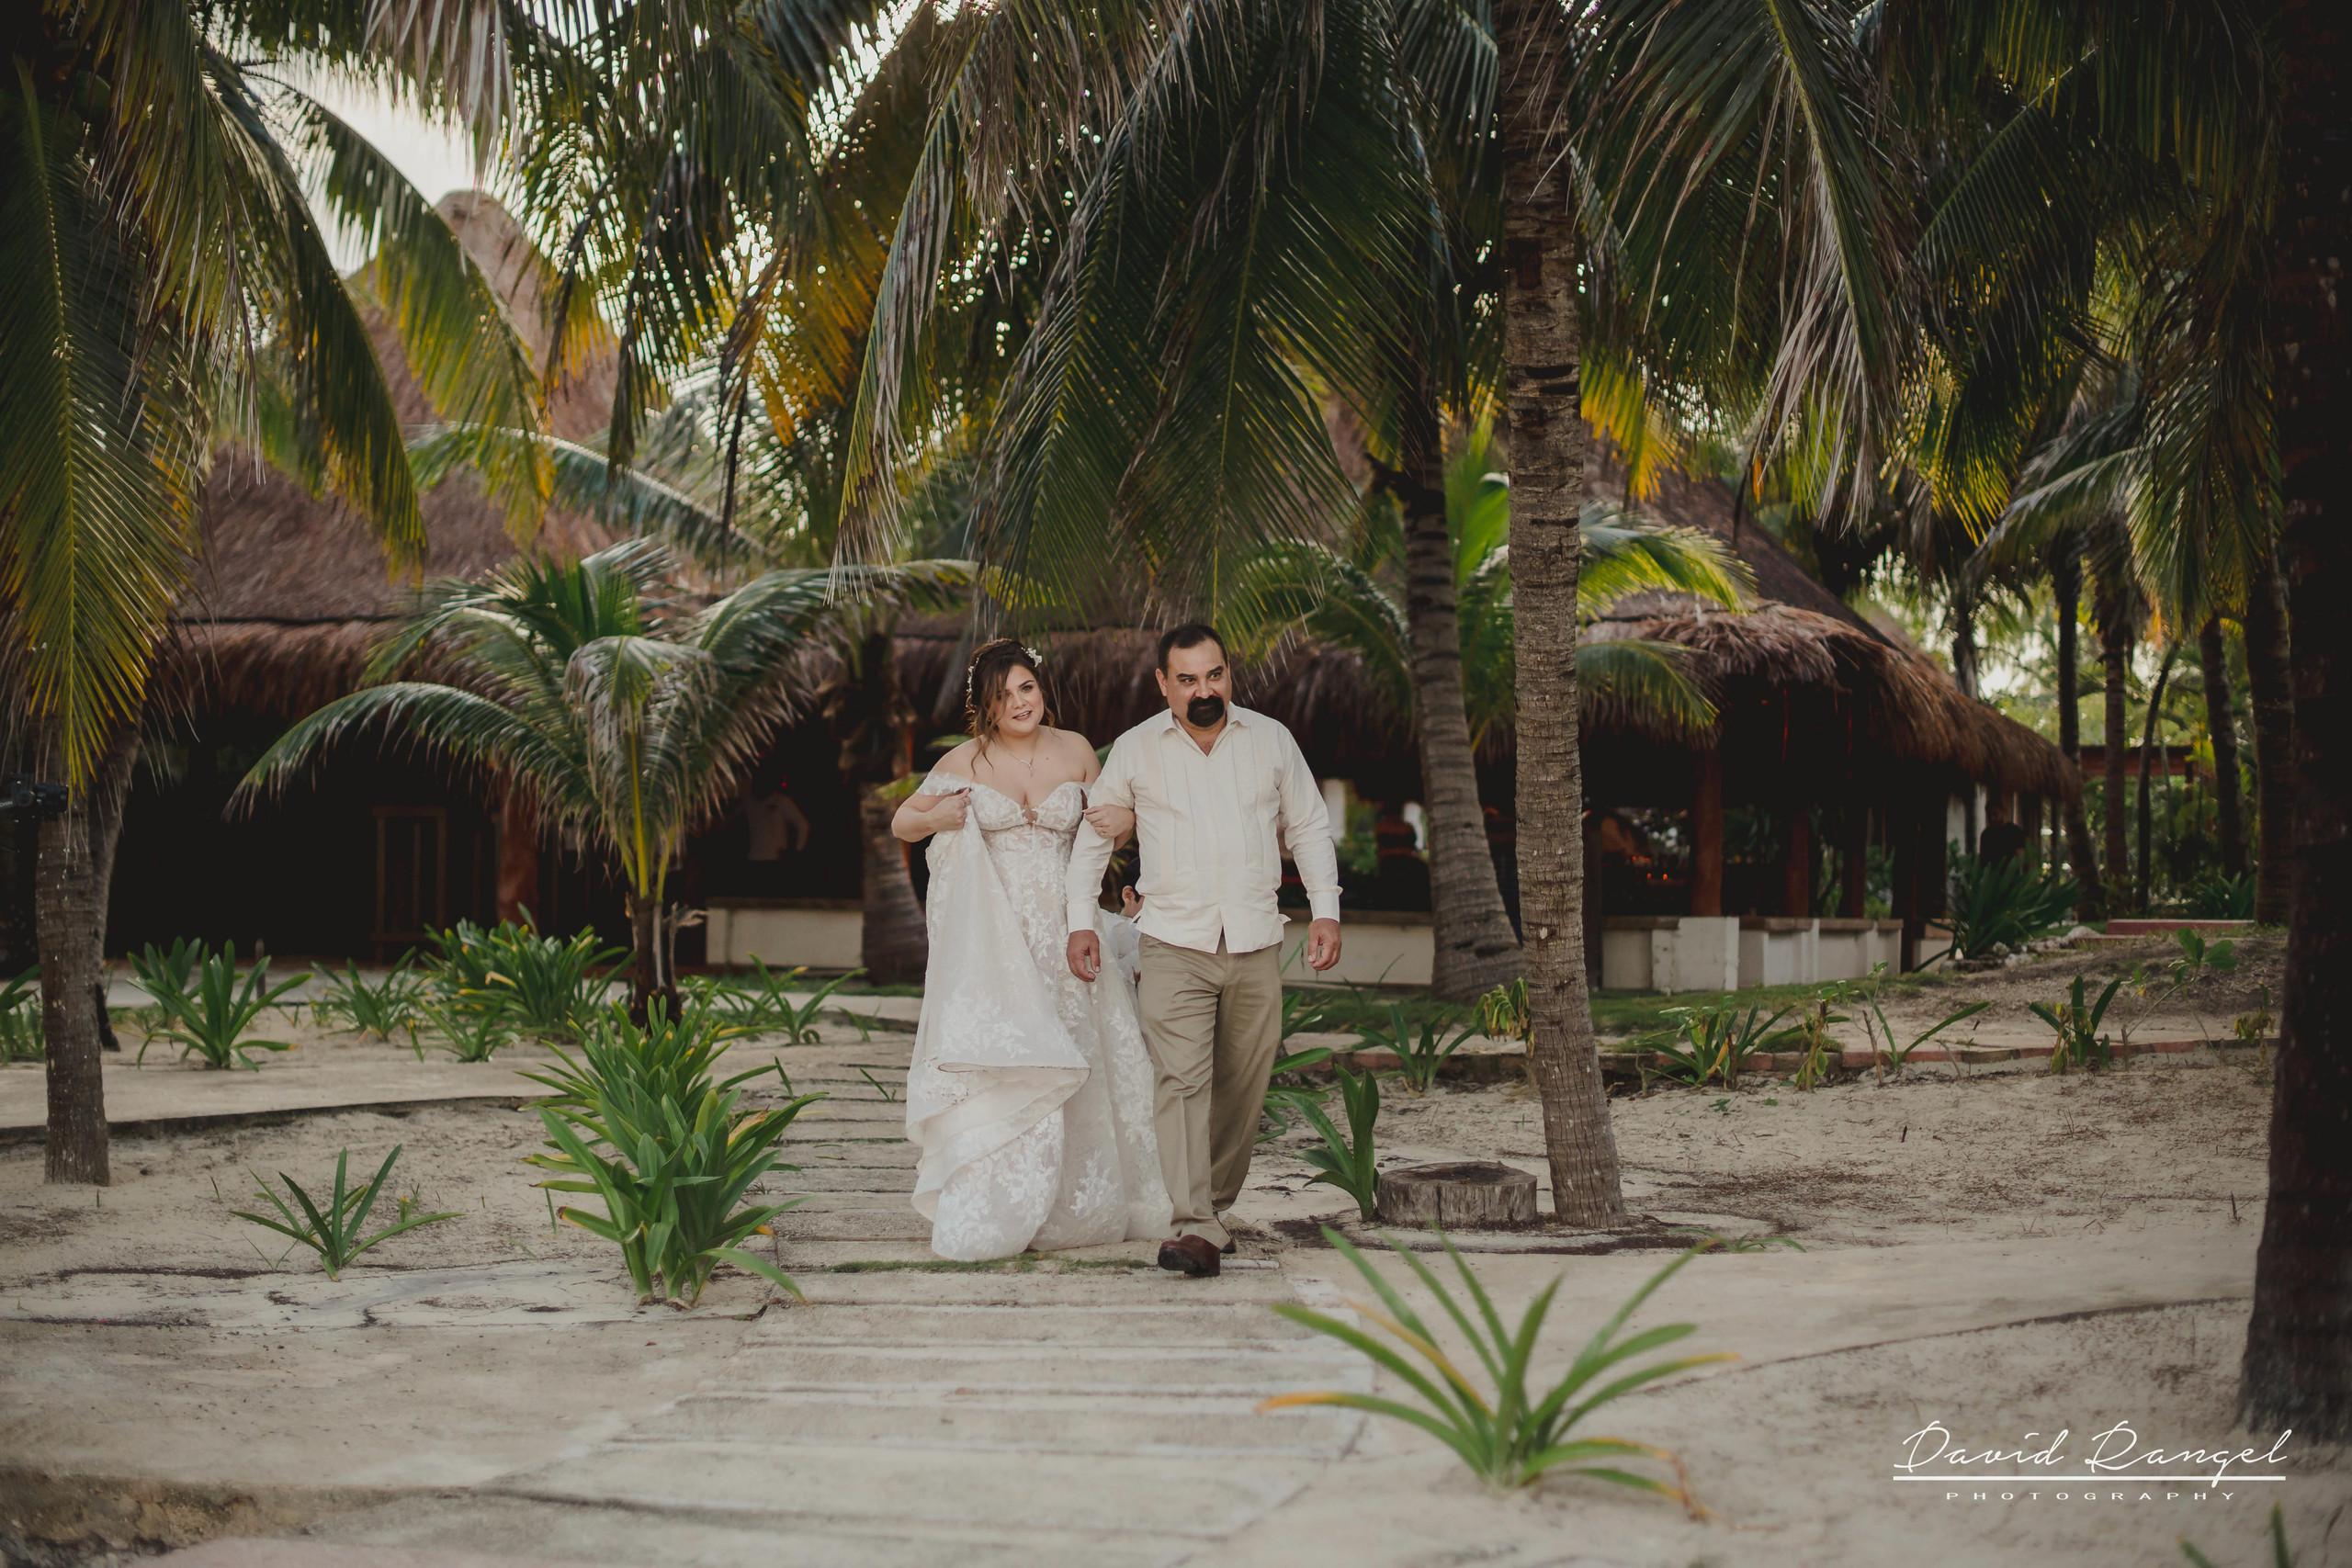 walk+to+the+aisle+father+bride+wedding+ceremony+dress+villa+chenera+isla+blanca+costa+mujeres+garden+beach